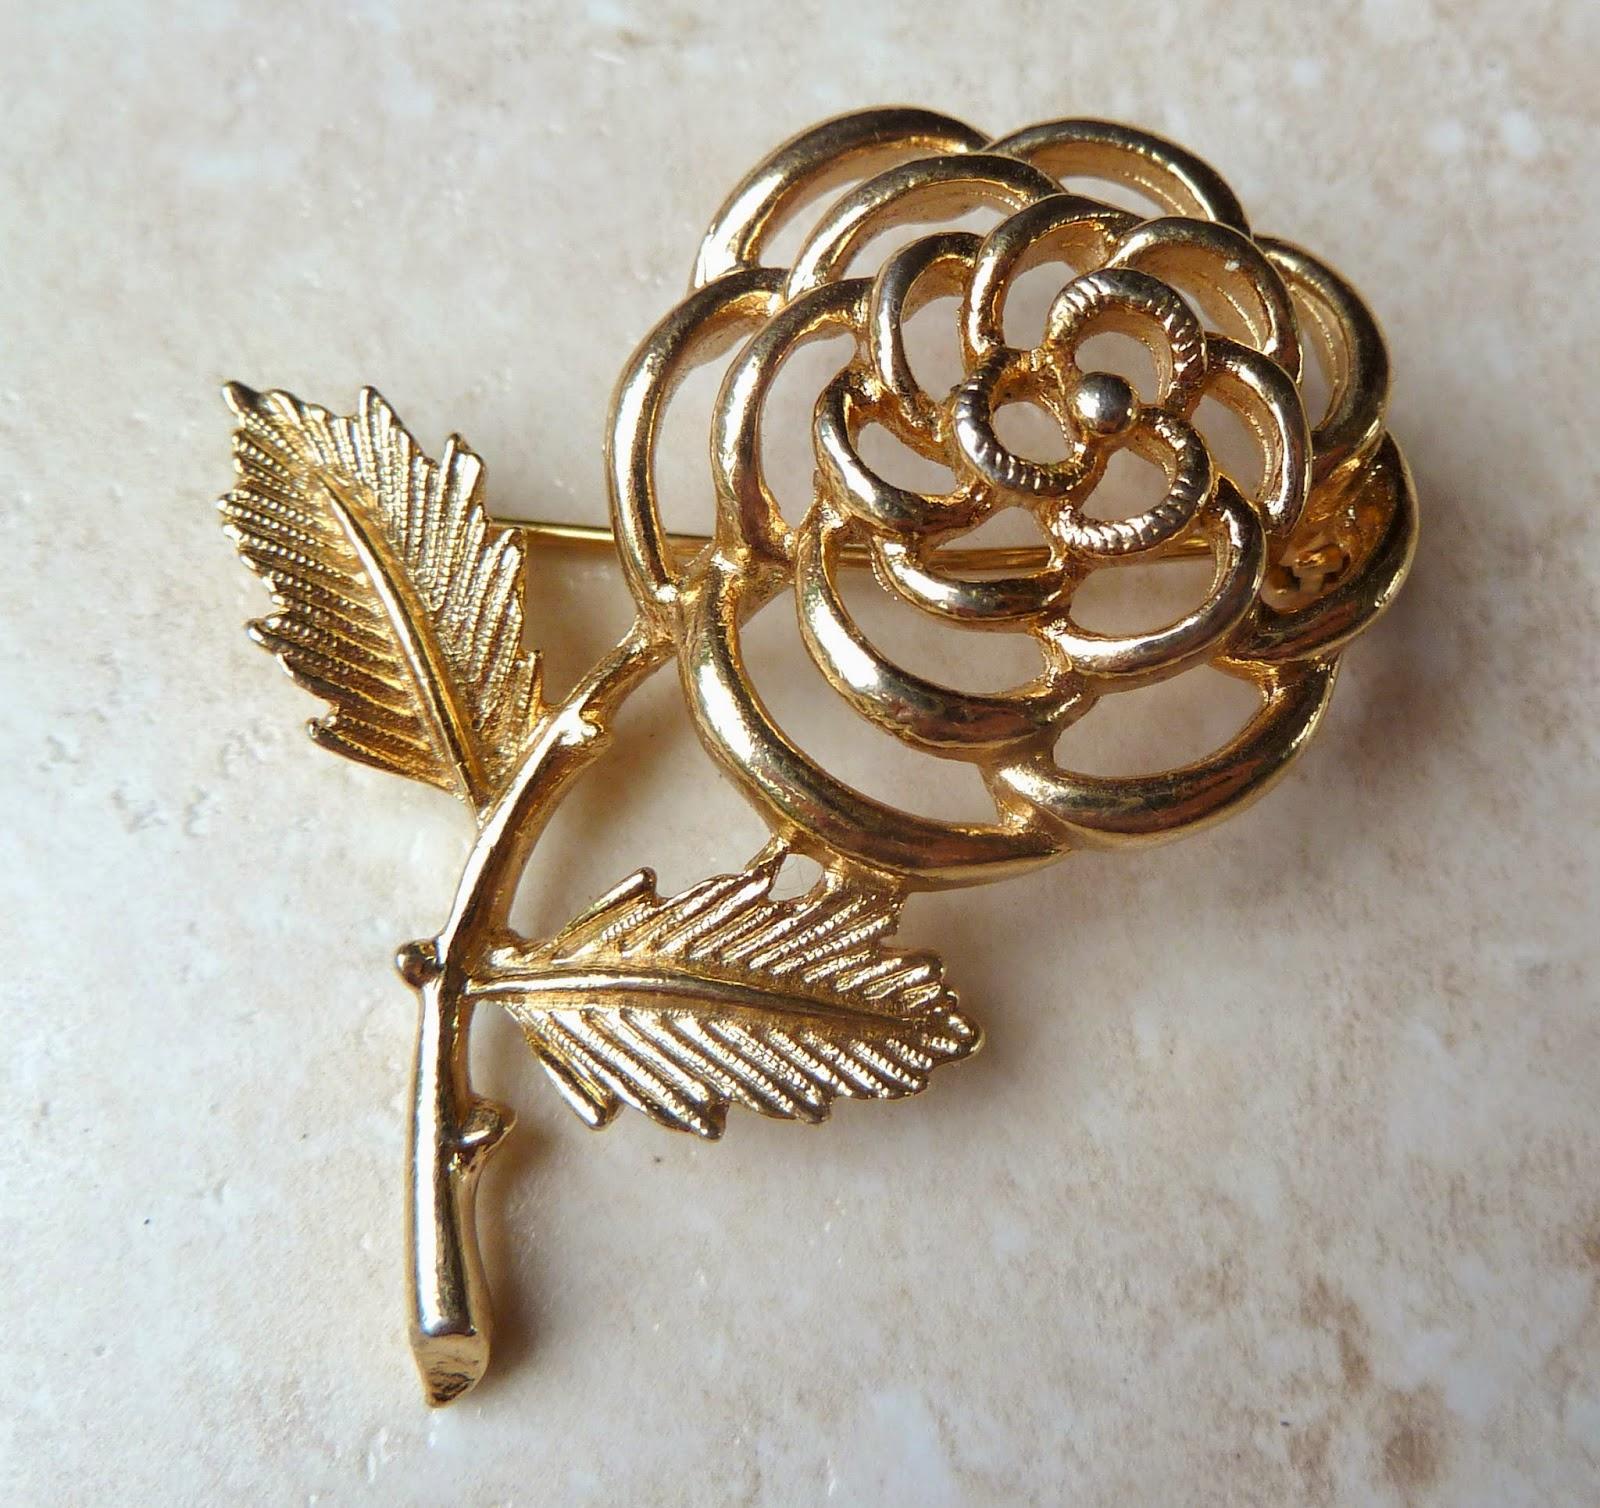 http://www.kcavintagegems.uk/vintage-sarah-coventry-open-work-rose-brooch-379-p.asp